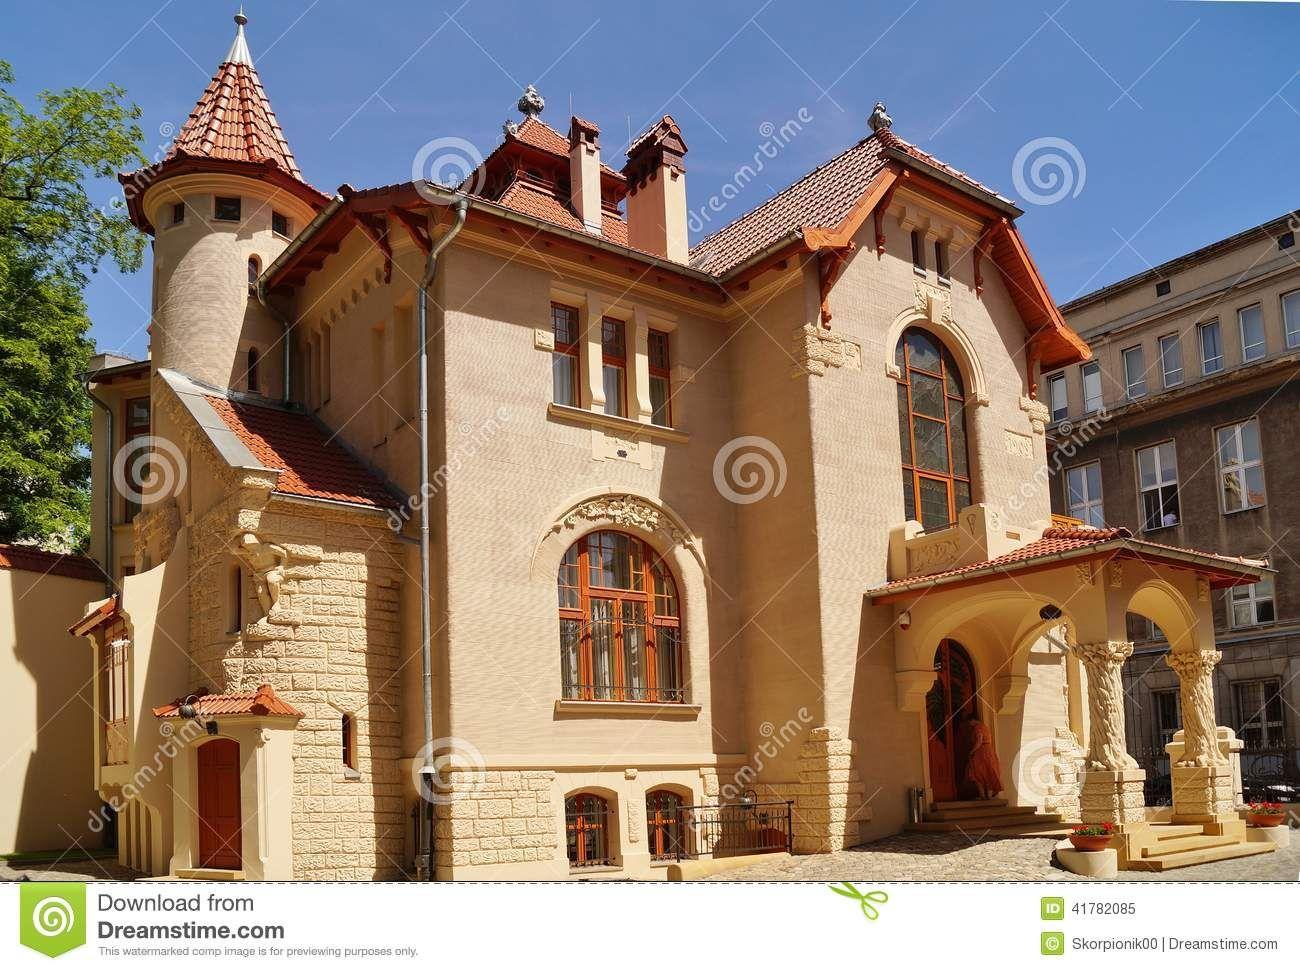 art nouveau buildings - ค้นหาด้วย Google